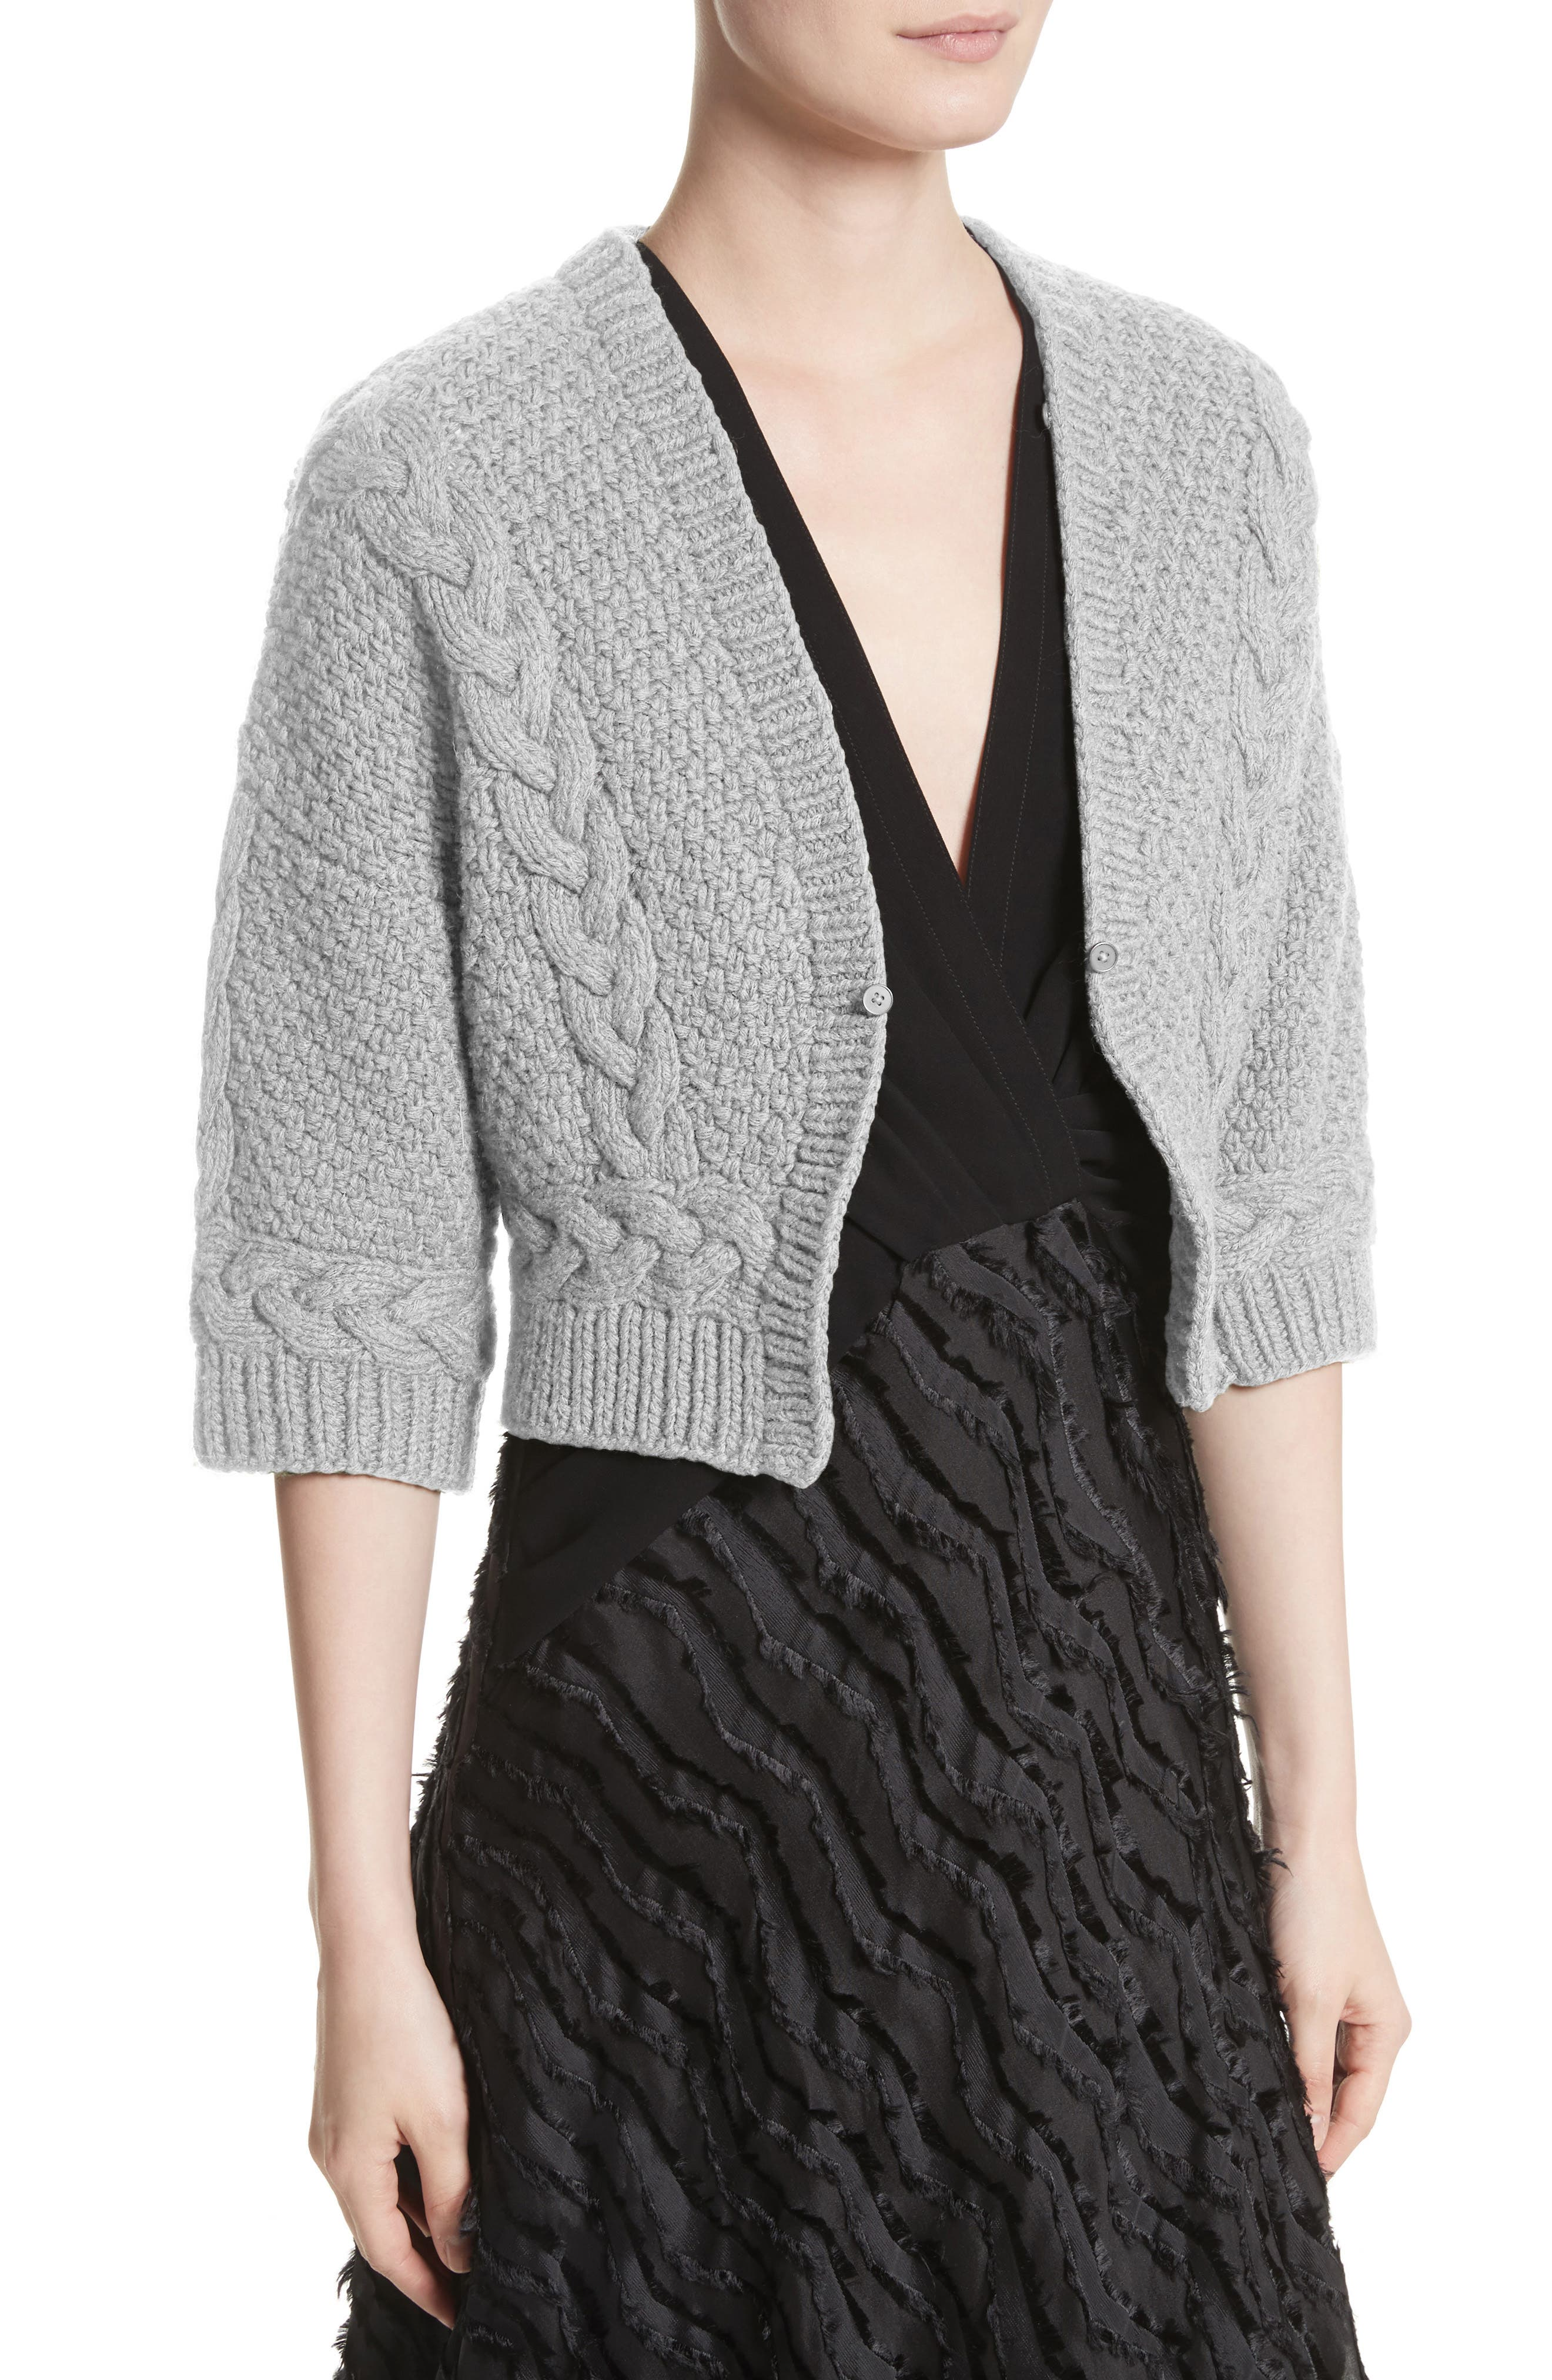 Merino Wool & Cashmere Knit Bolero with Removable Genuine Fox Fur Collar,                             Alternate thumbnail 8, color,                             Grey